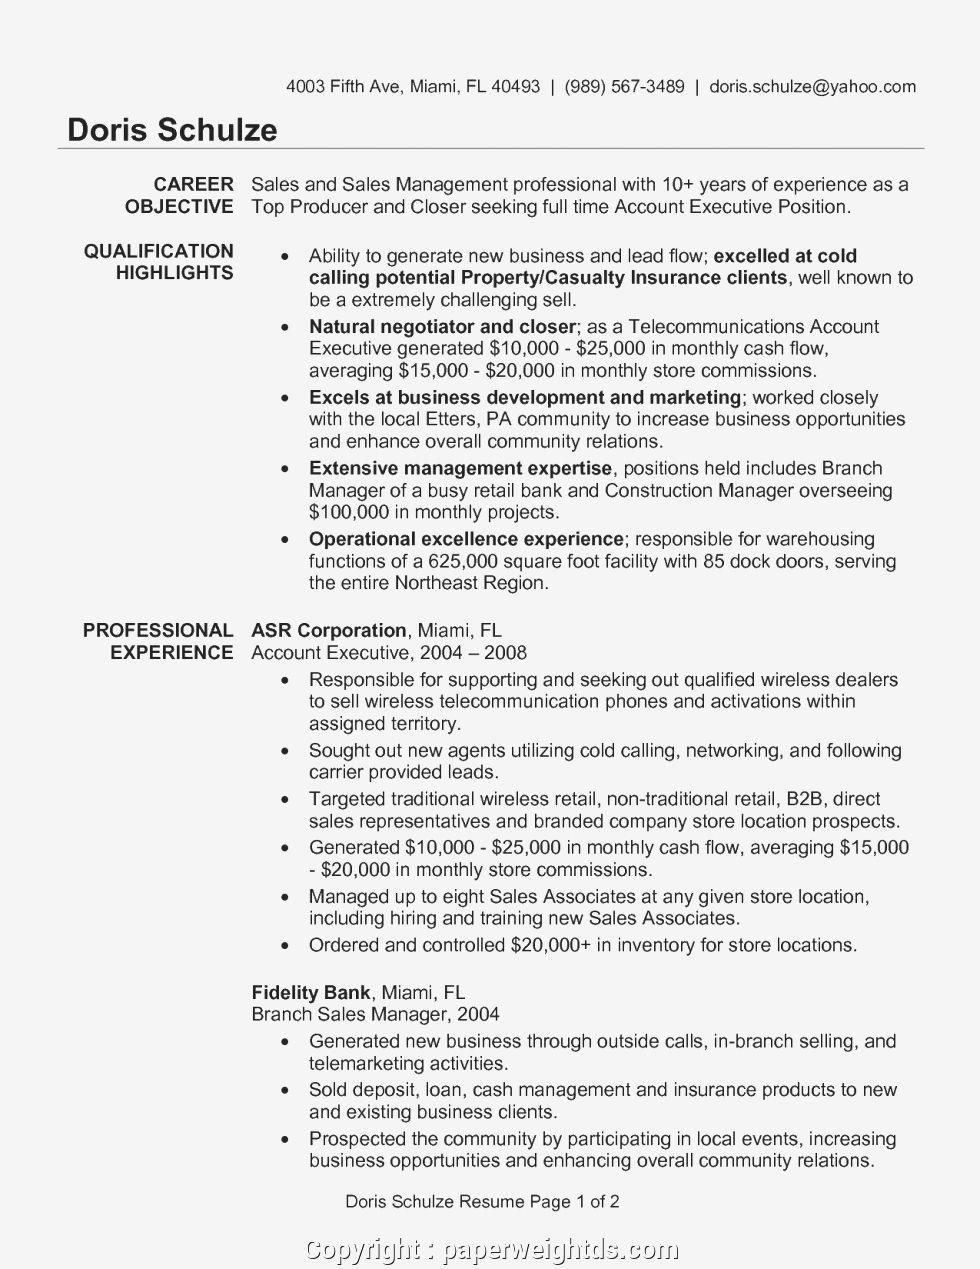 Account Executive Sample Resume Account Manager Sample Resume Account Executive Resume Examples Key A Resume Examples Best Resume Template Account Executive